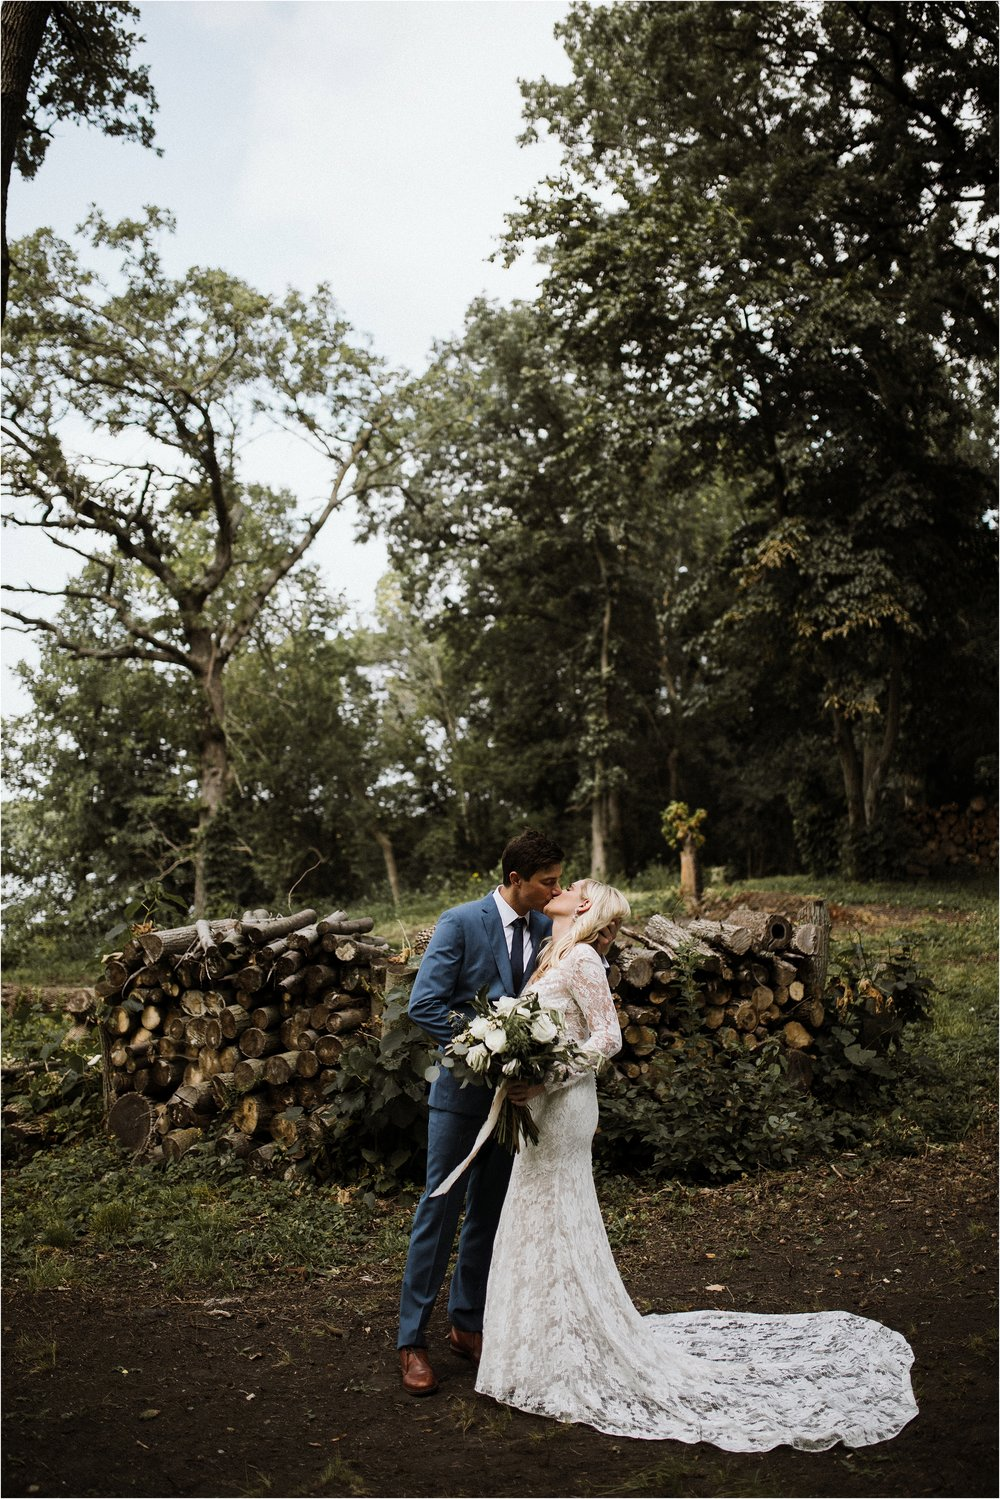 backyard-minneapolis-willmar-minnesota-wedding-photography_0011.jpg